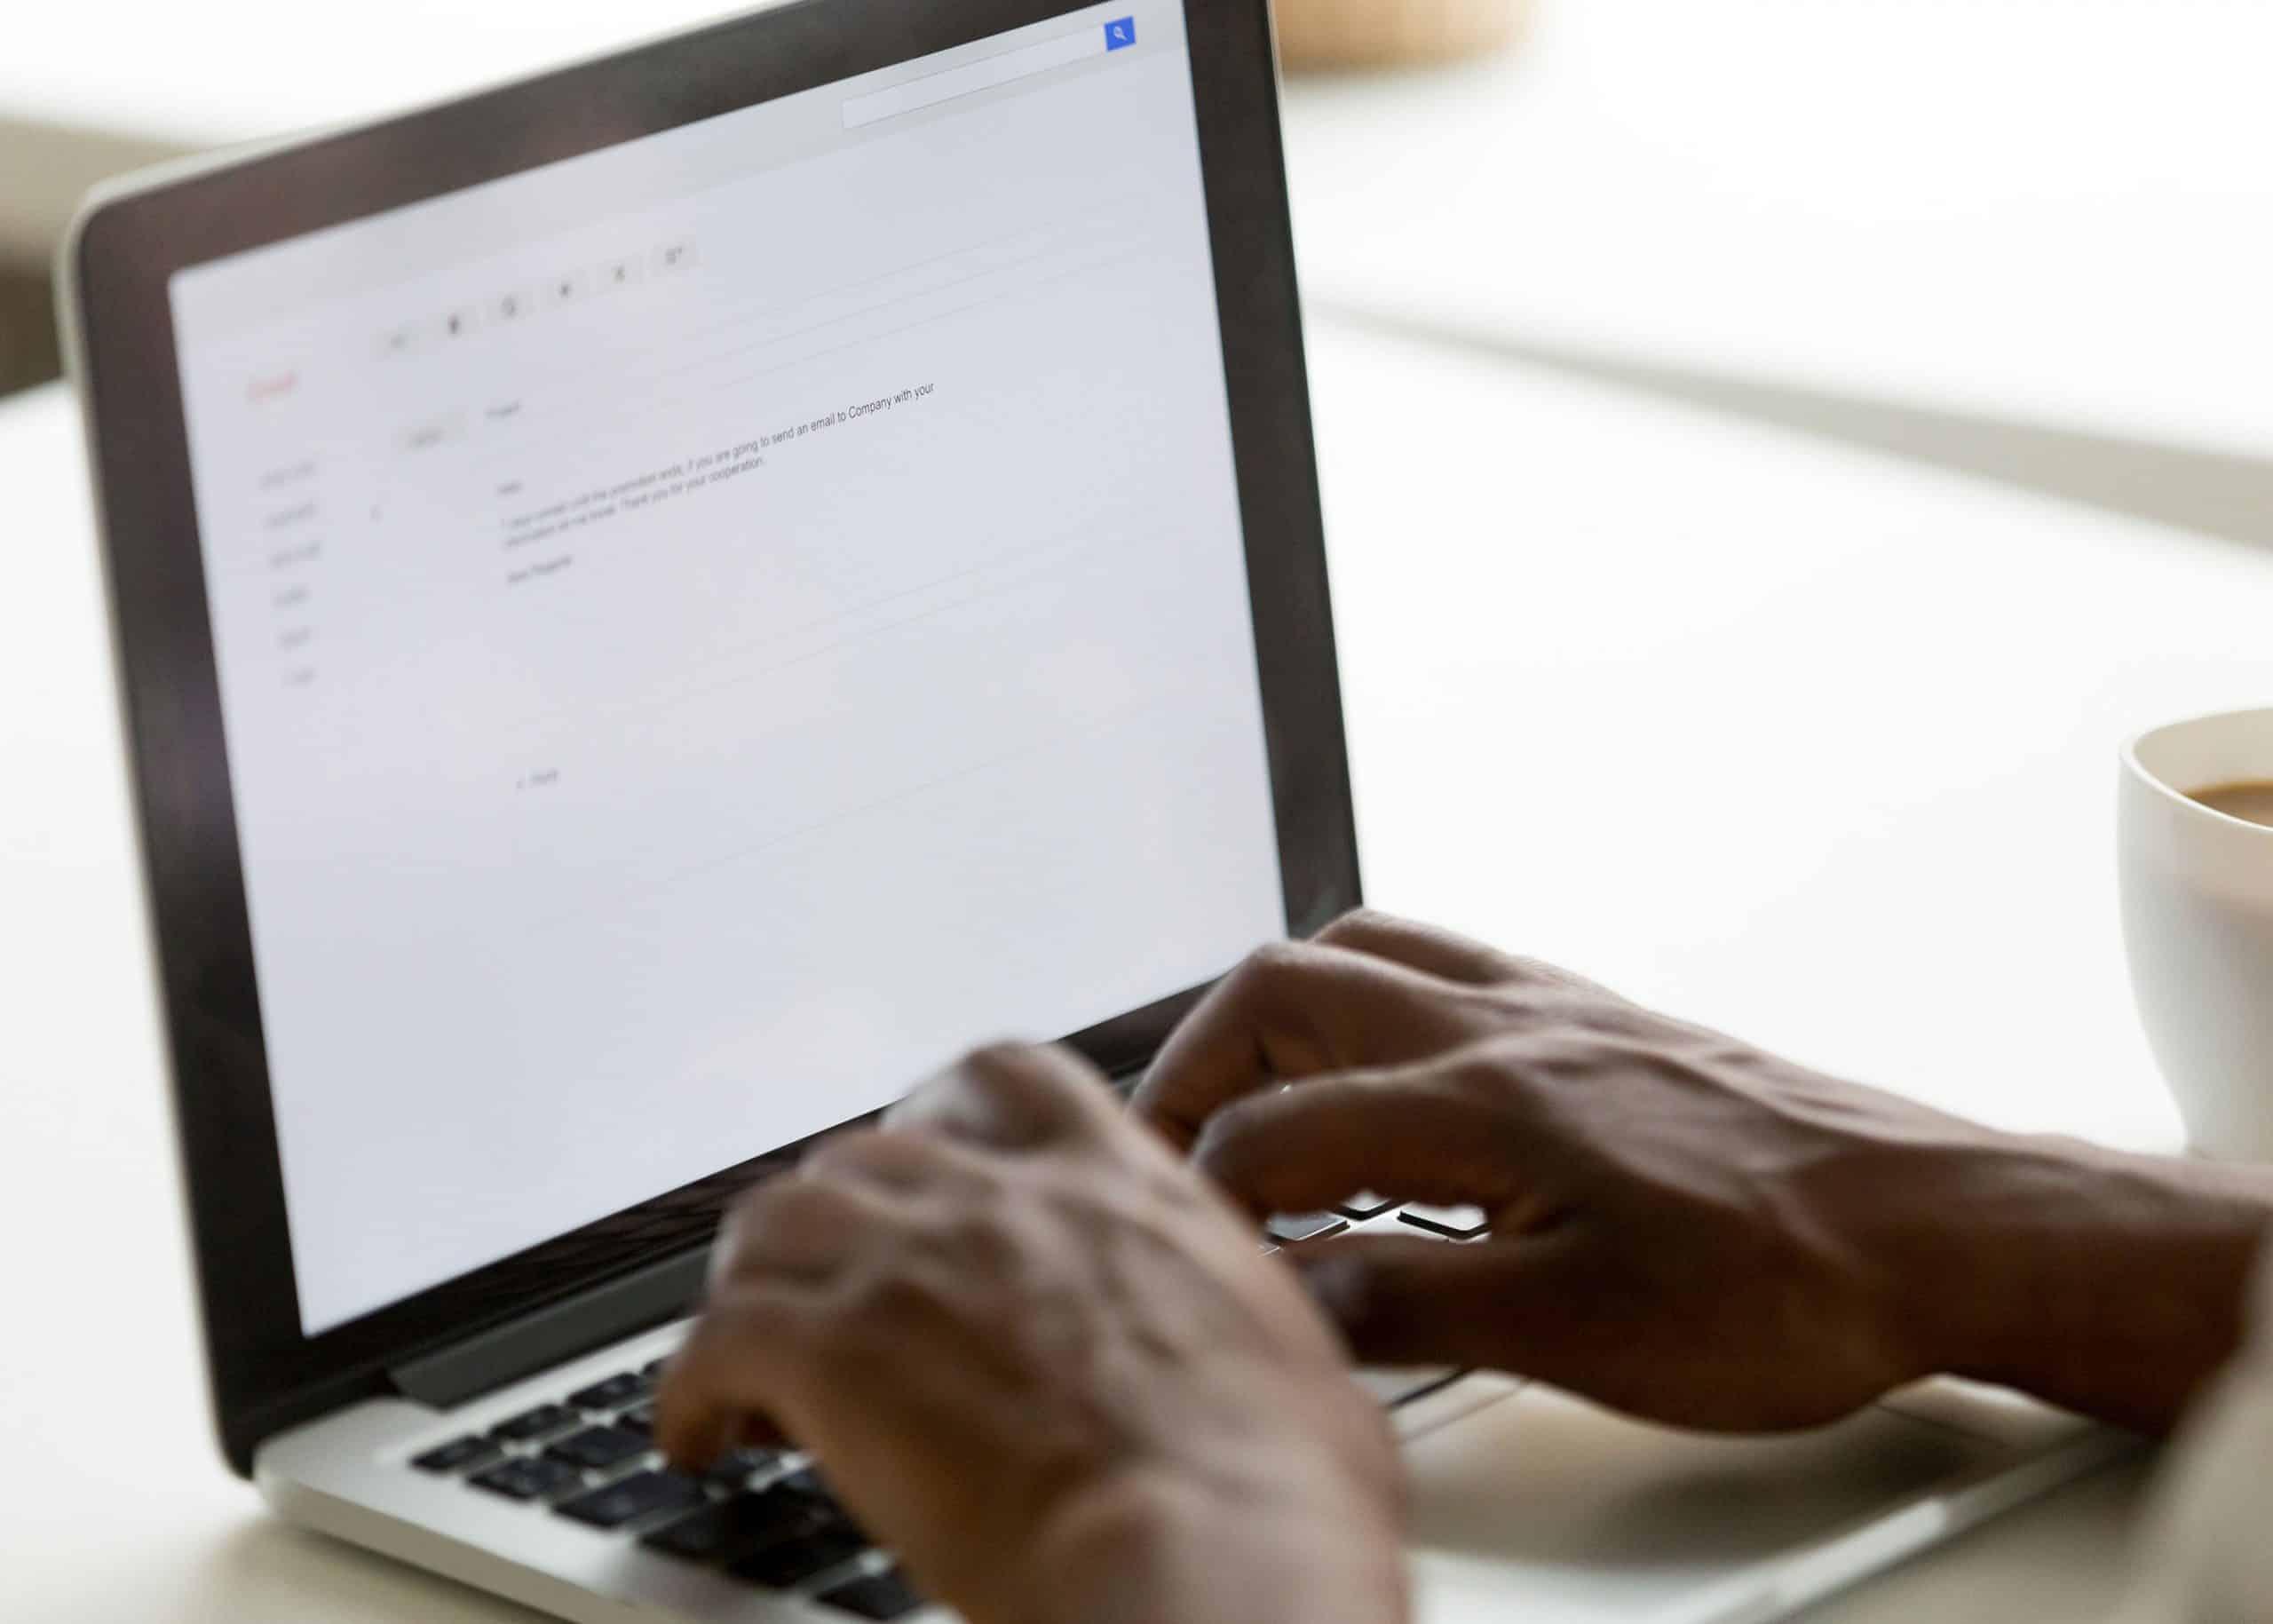 email productivity teknowlogi featured